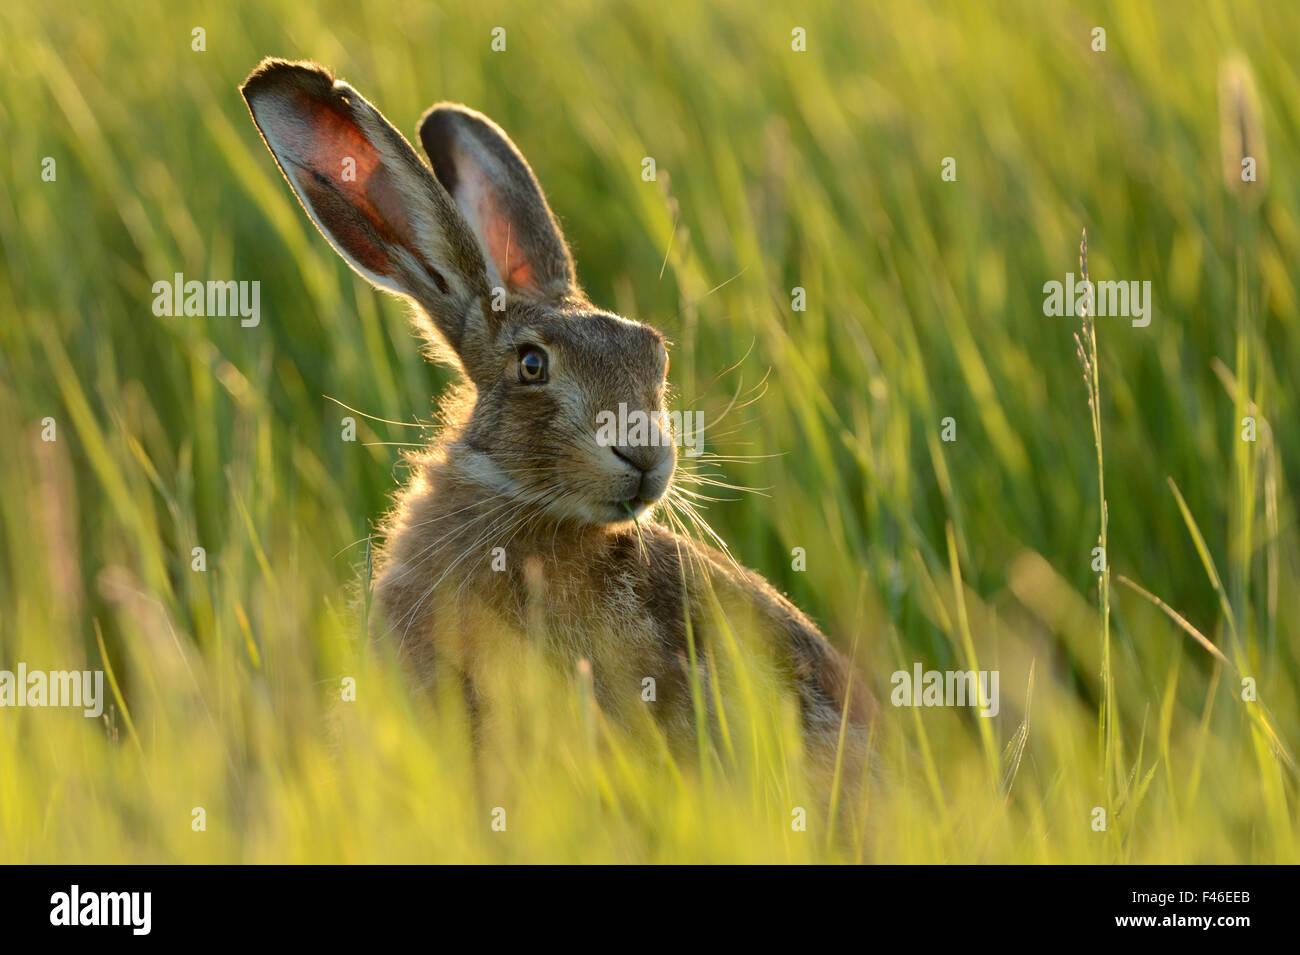 European hare (Lepus europaeus) in grass field, UK, May - Stock Image